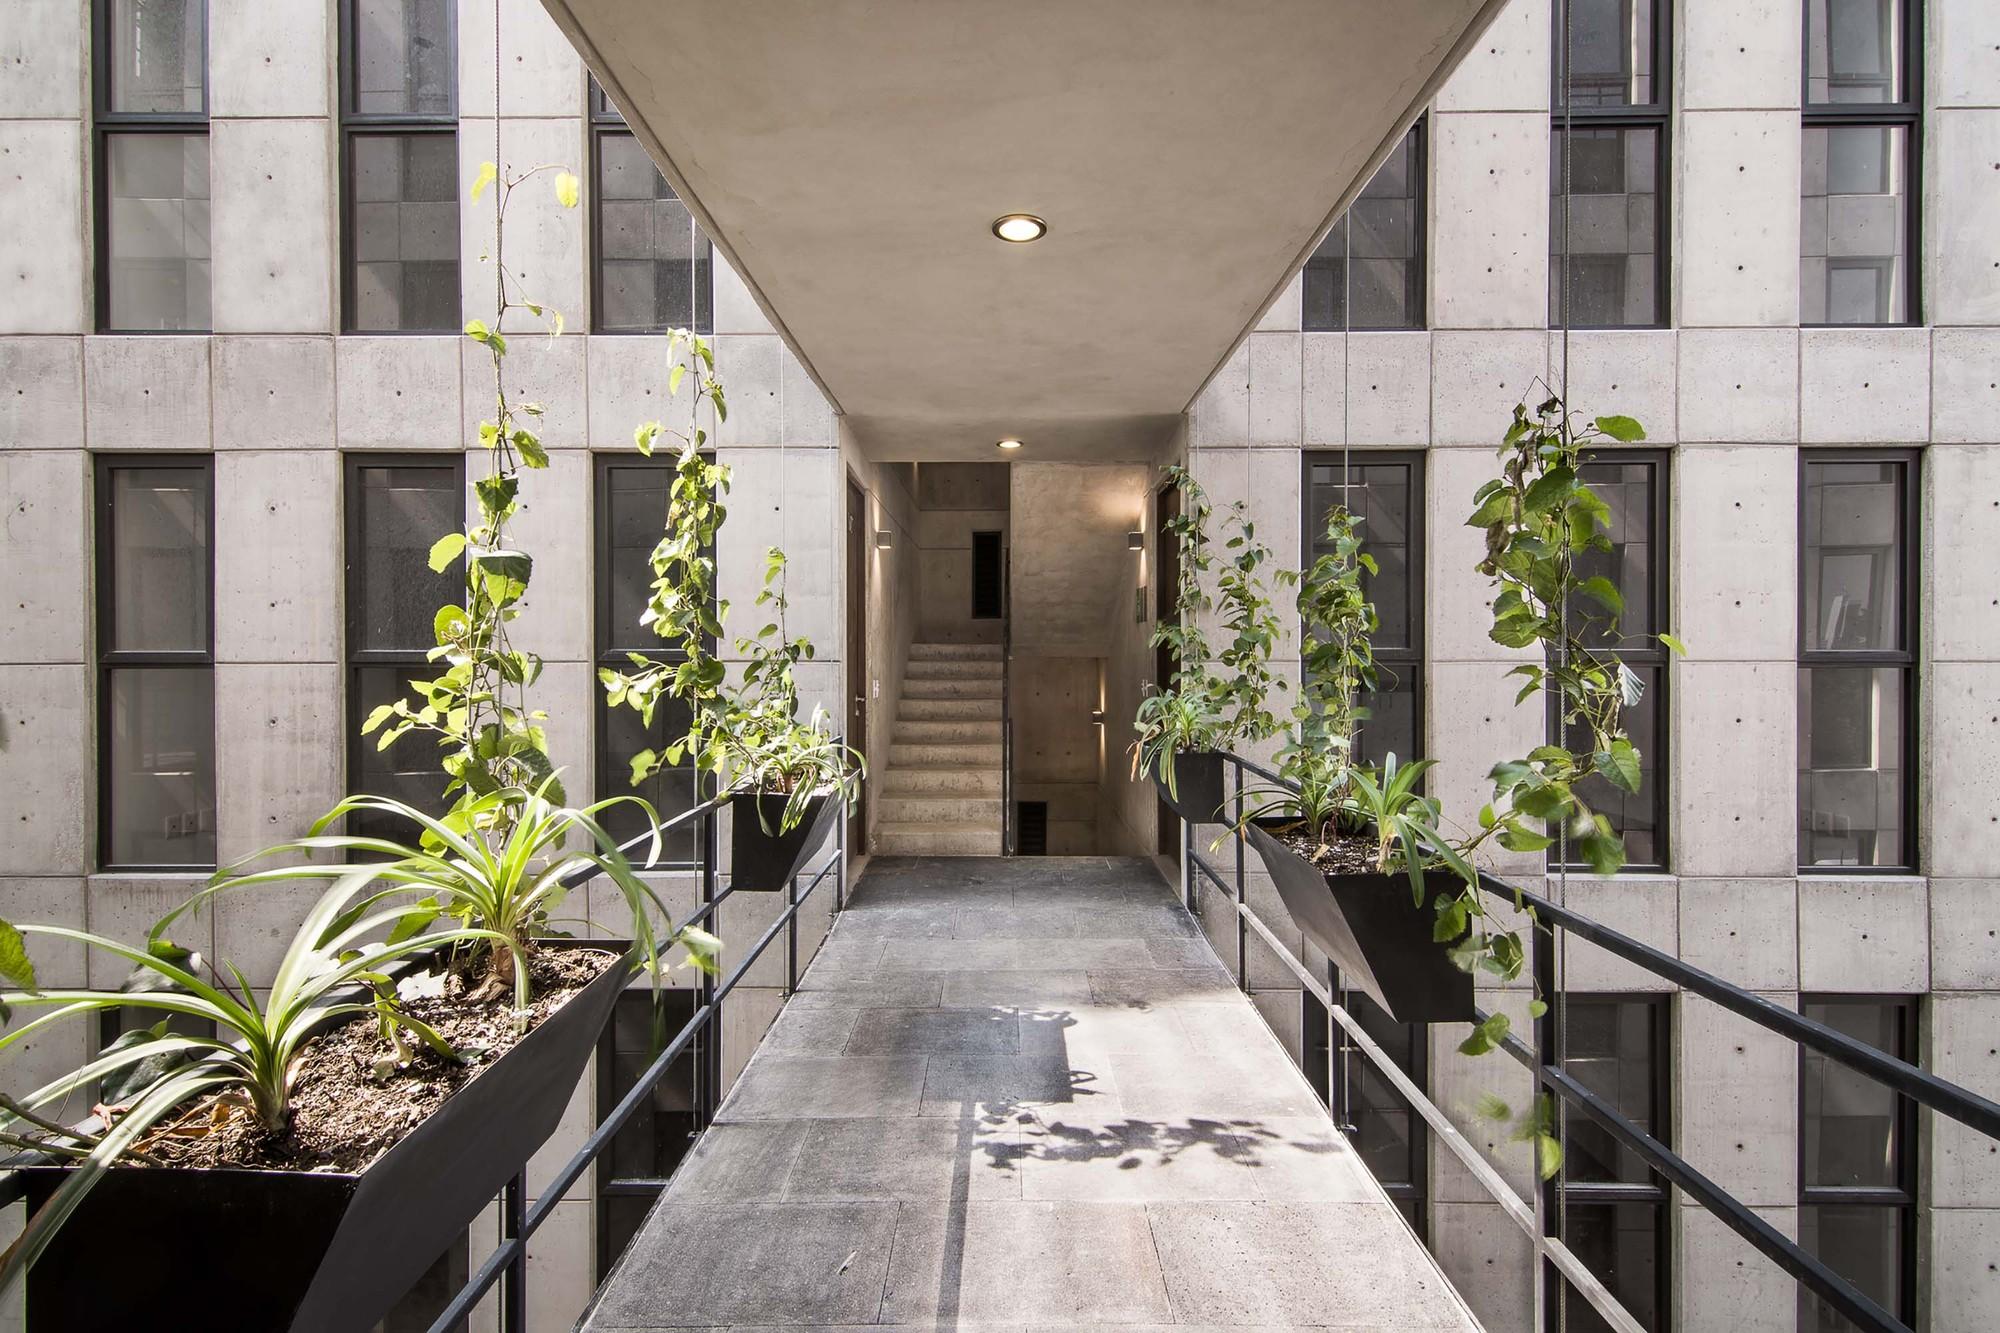 Popocatepetl 143 / HGR Arquitectos